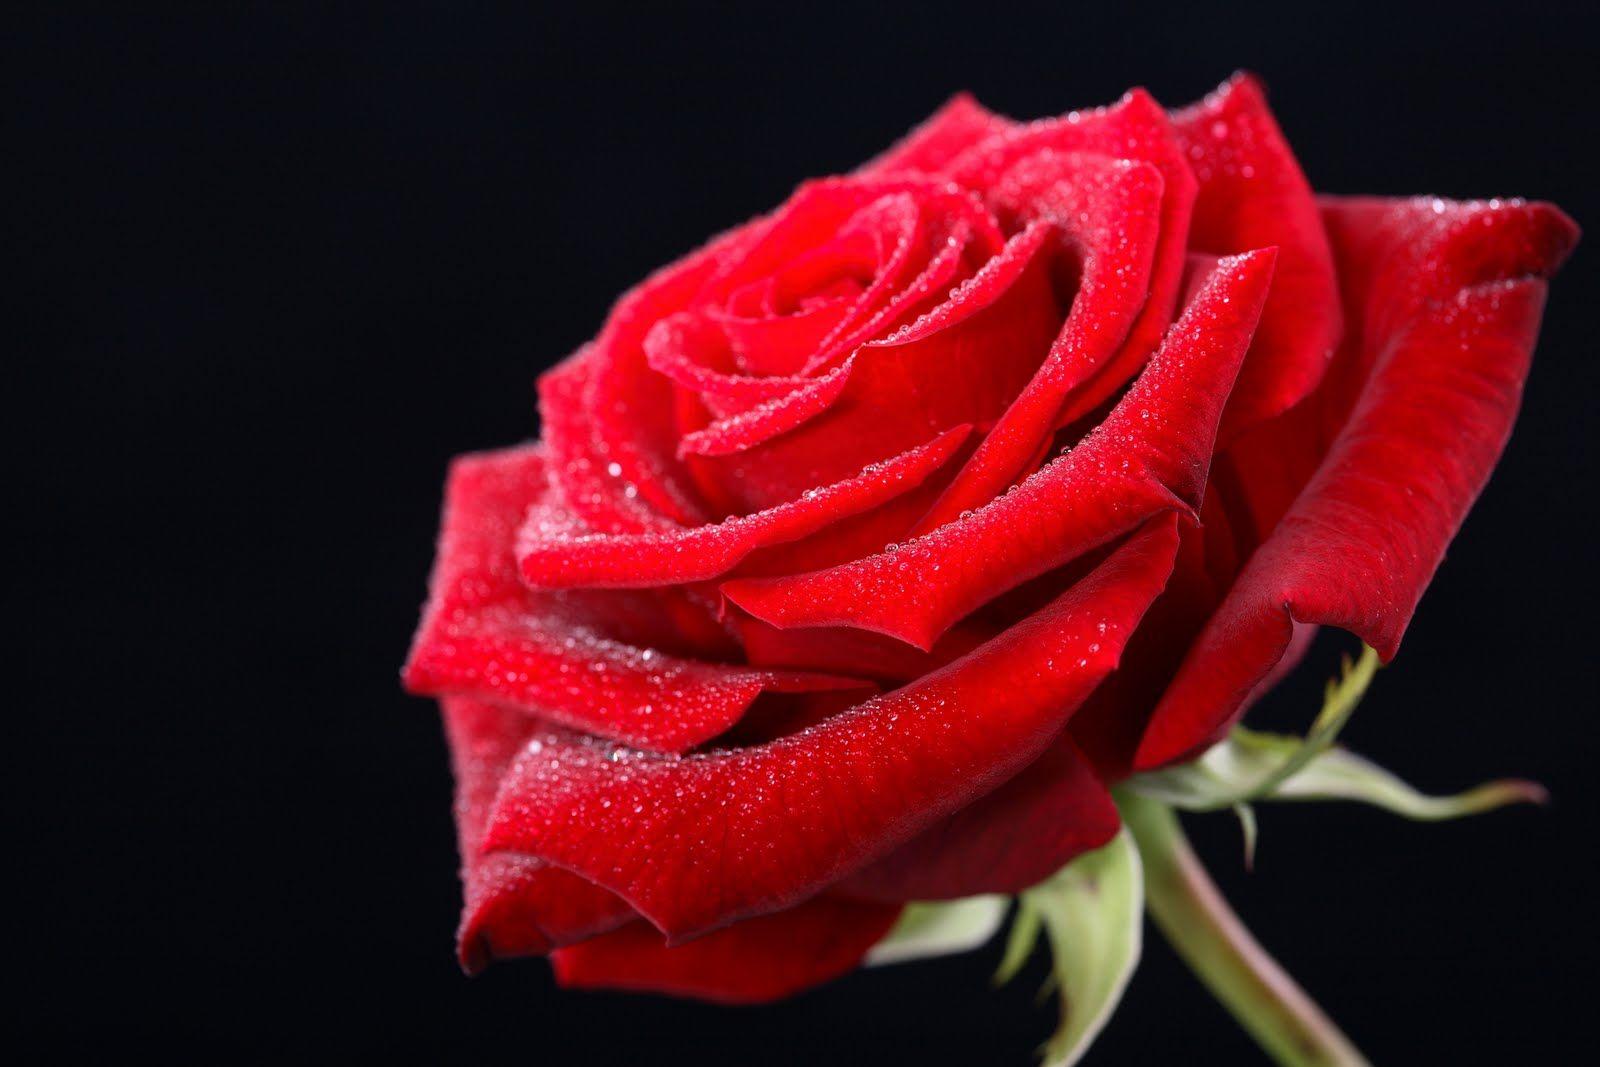 Wallpapers Rosas Rojas: Rosas Rojas Para Fondo De Pantalla En 4K 7 HD Wallpapers